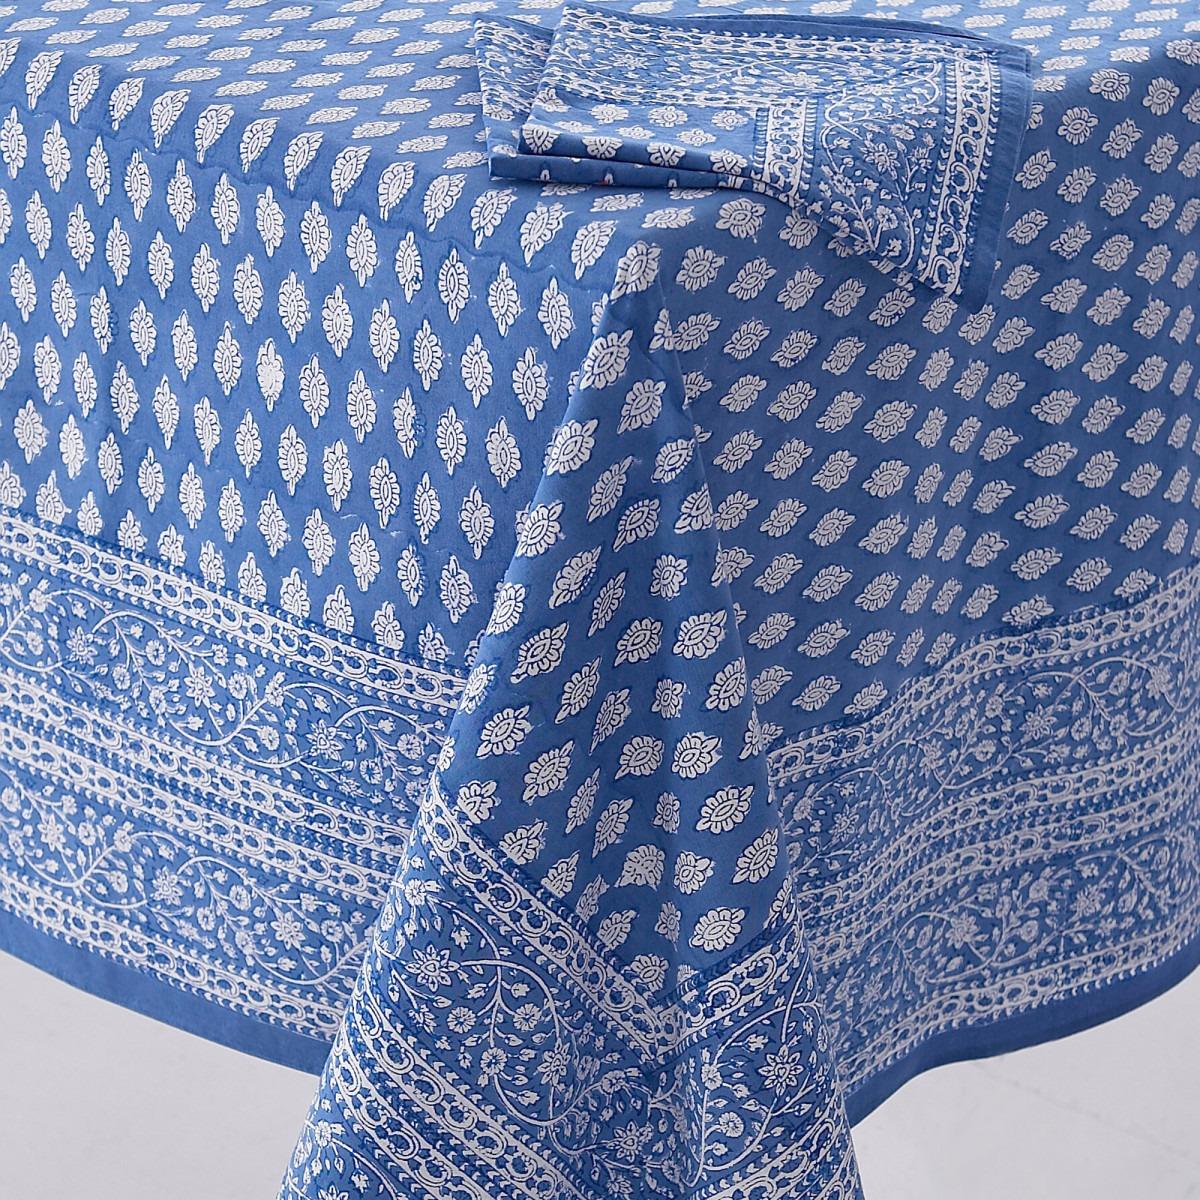 Hand Block Printed Tablecloths